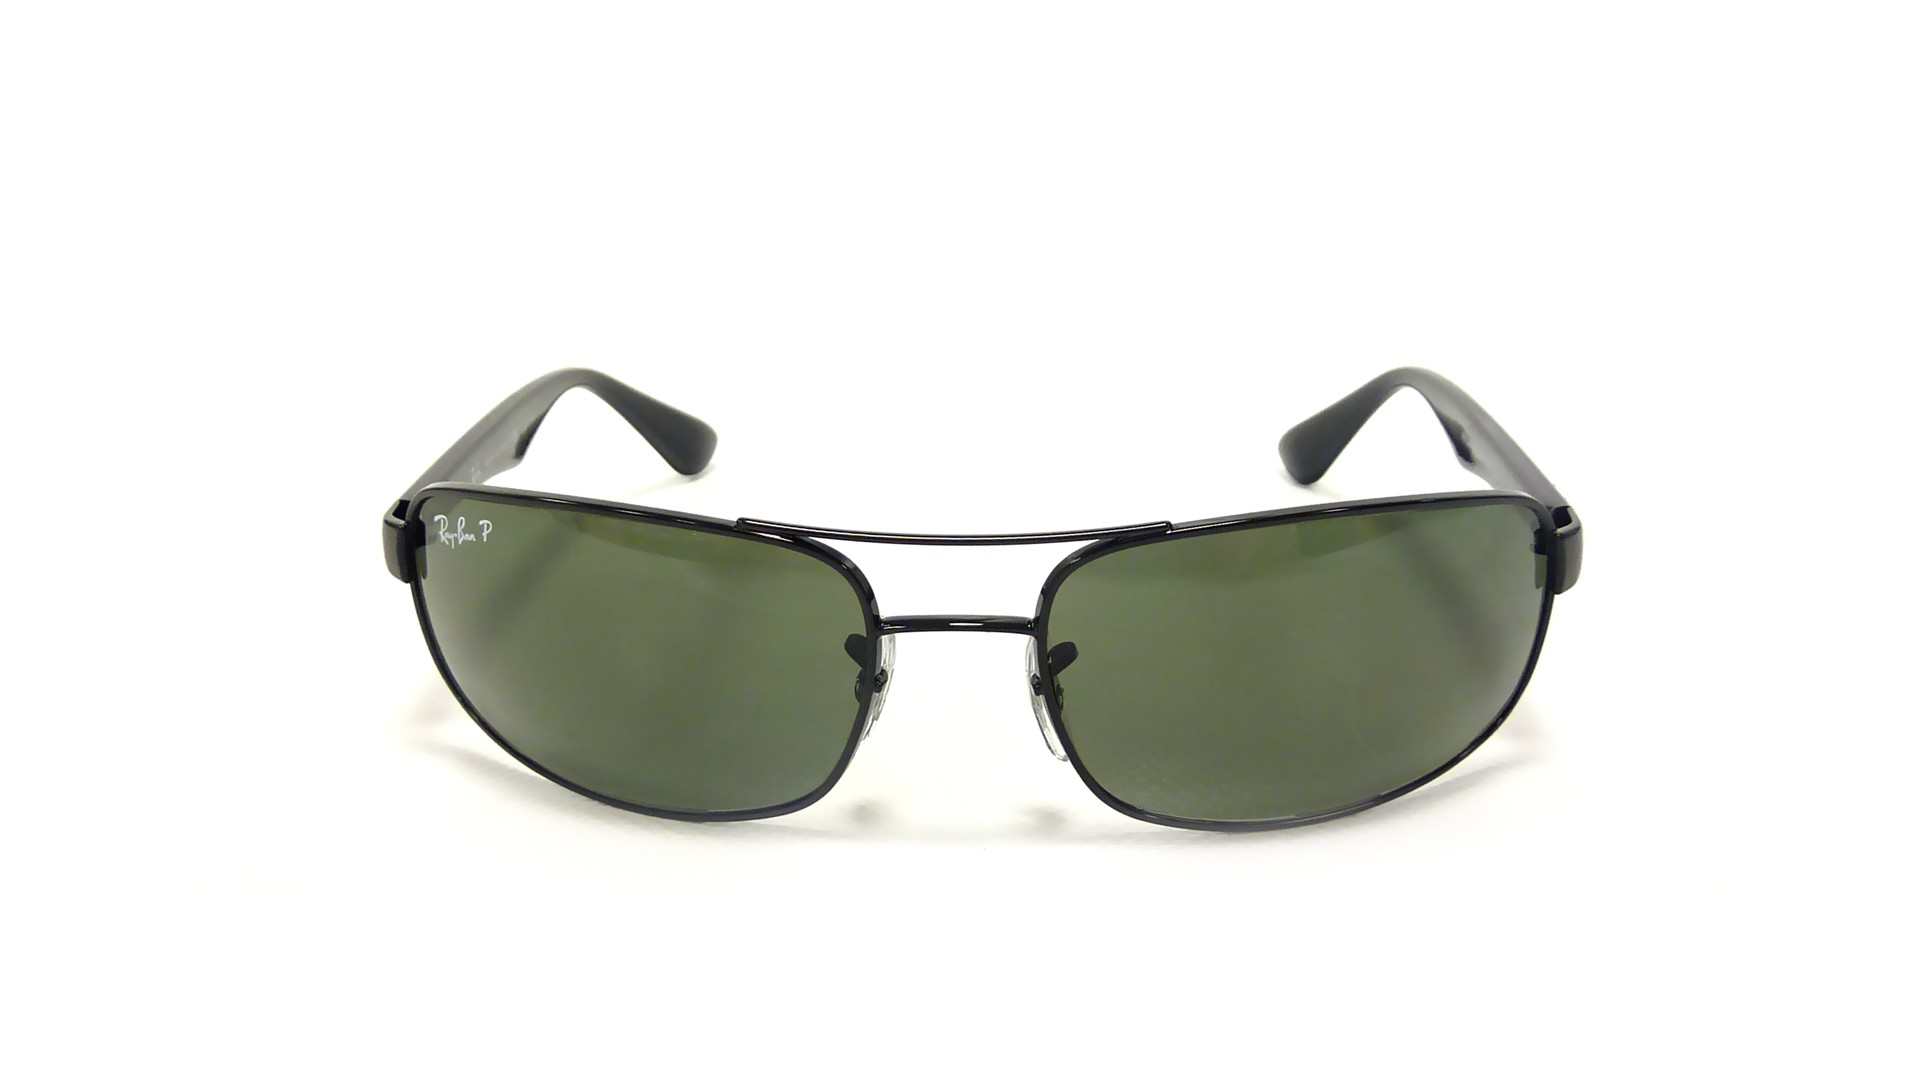 c6f686b30a6 Sunglasses Ray-Ban RB3445 002 58 61-17 Black Large Polarized